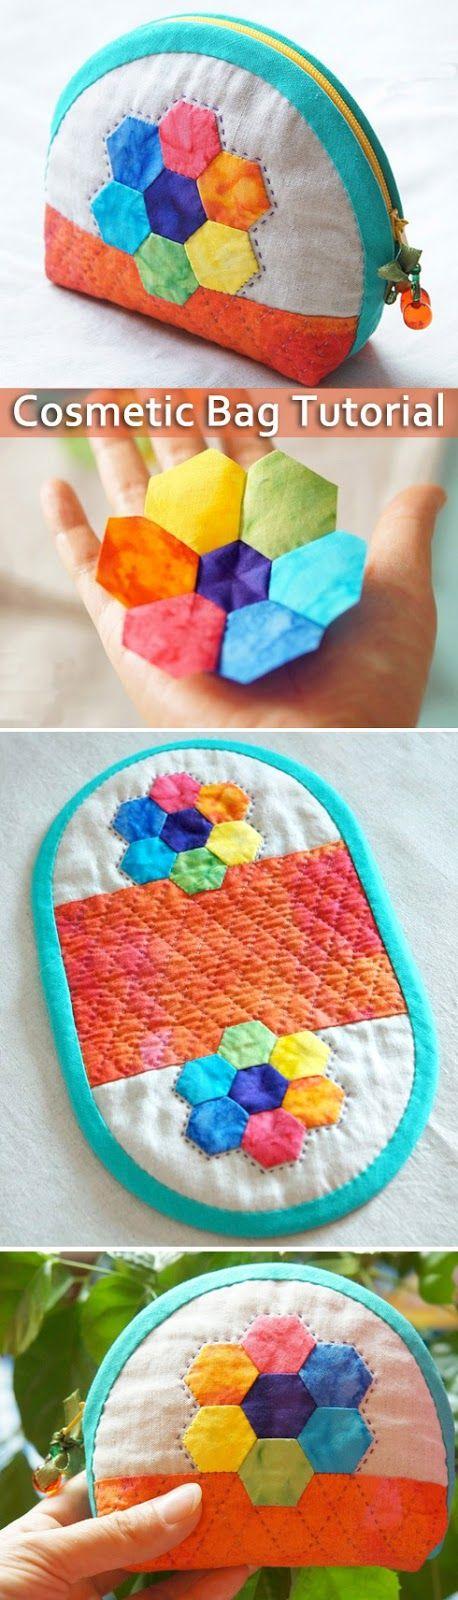 Makeup Bags Tutorials, Diy Quilts, Purses Tutorials. Patchwork & Quilts. Косметичка или кошелек  http://www.handmadiya.com/2015/09/zipper-cosmetic-bag-tutorial-patchwork.html